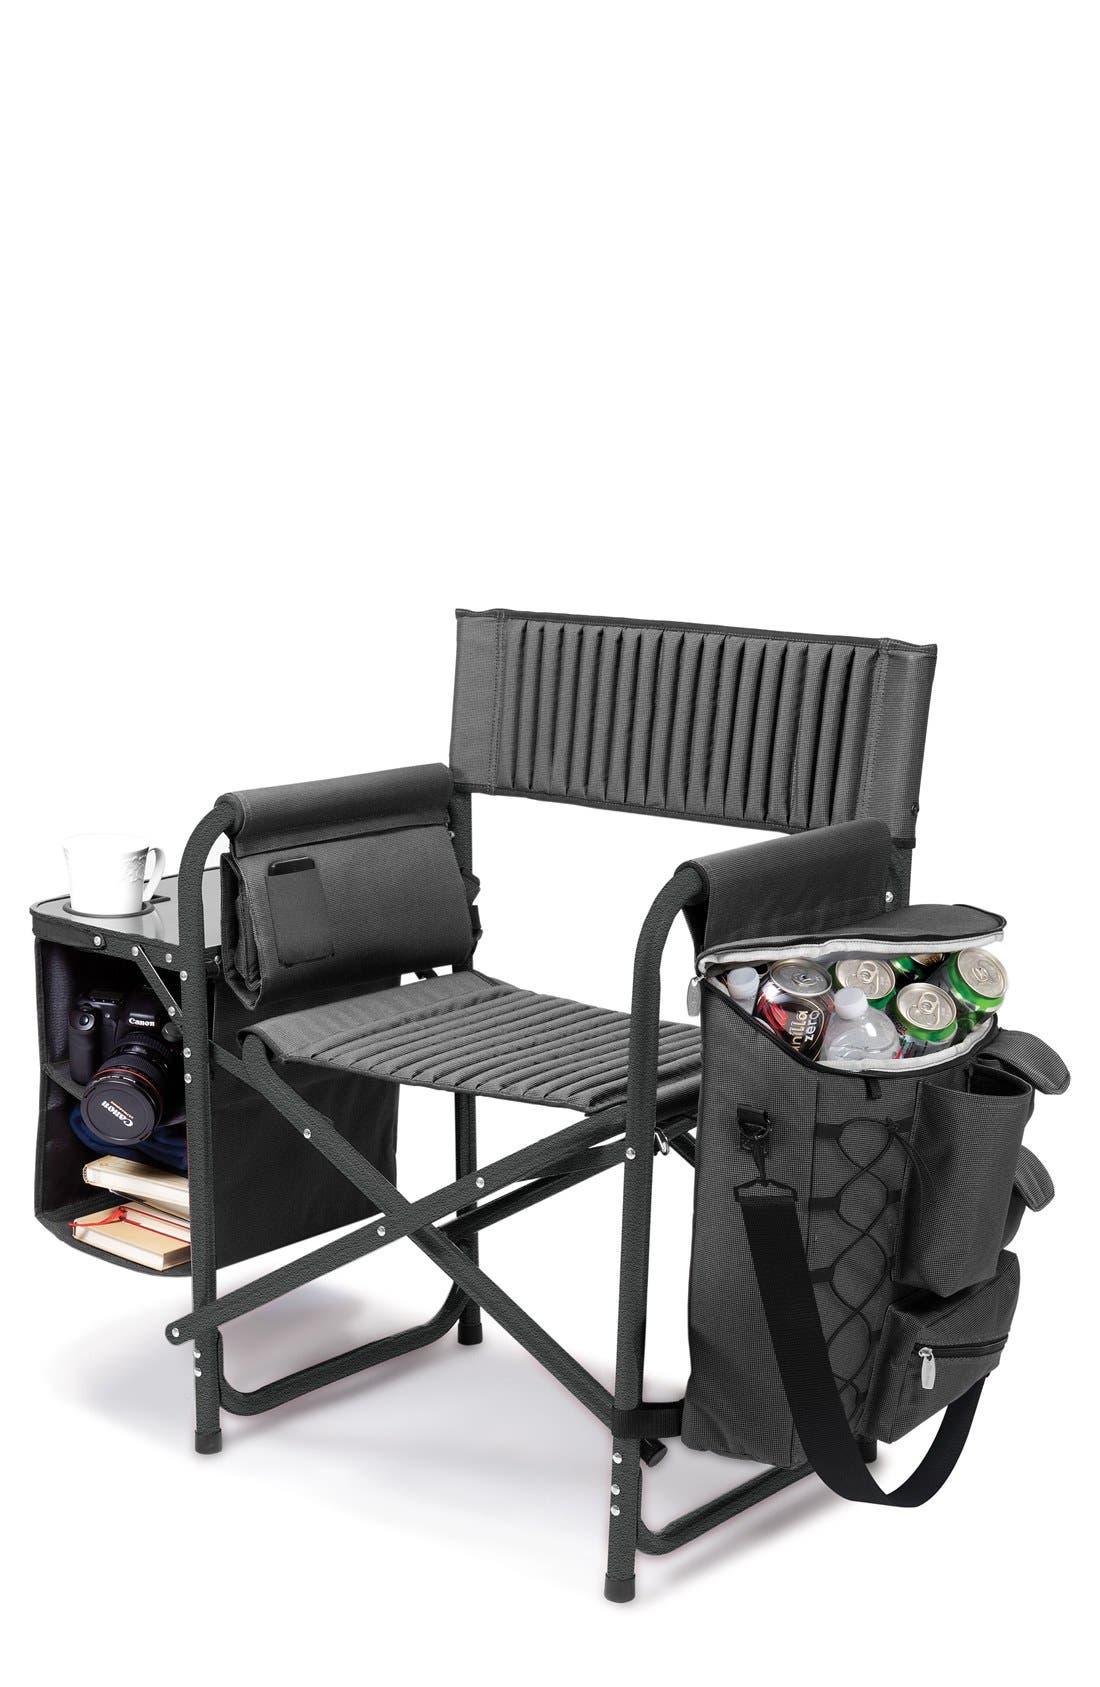 'Fusion' Lawn Chair,                         Main,                         color, Black